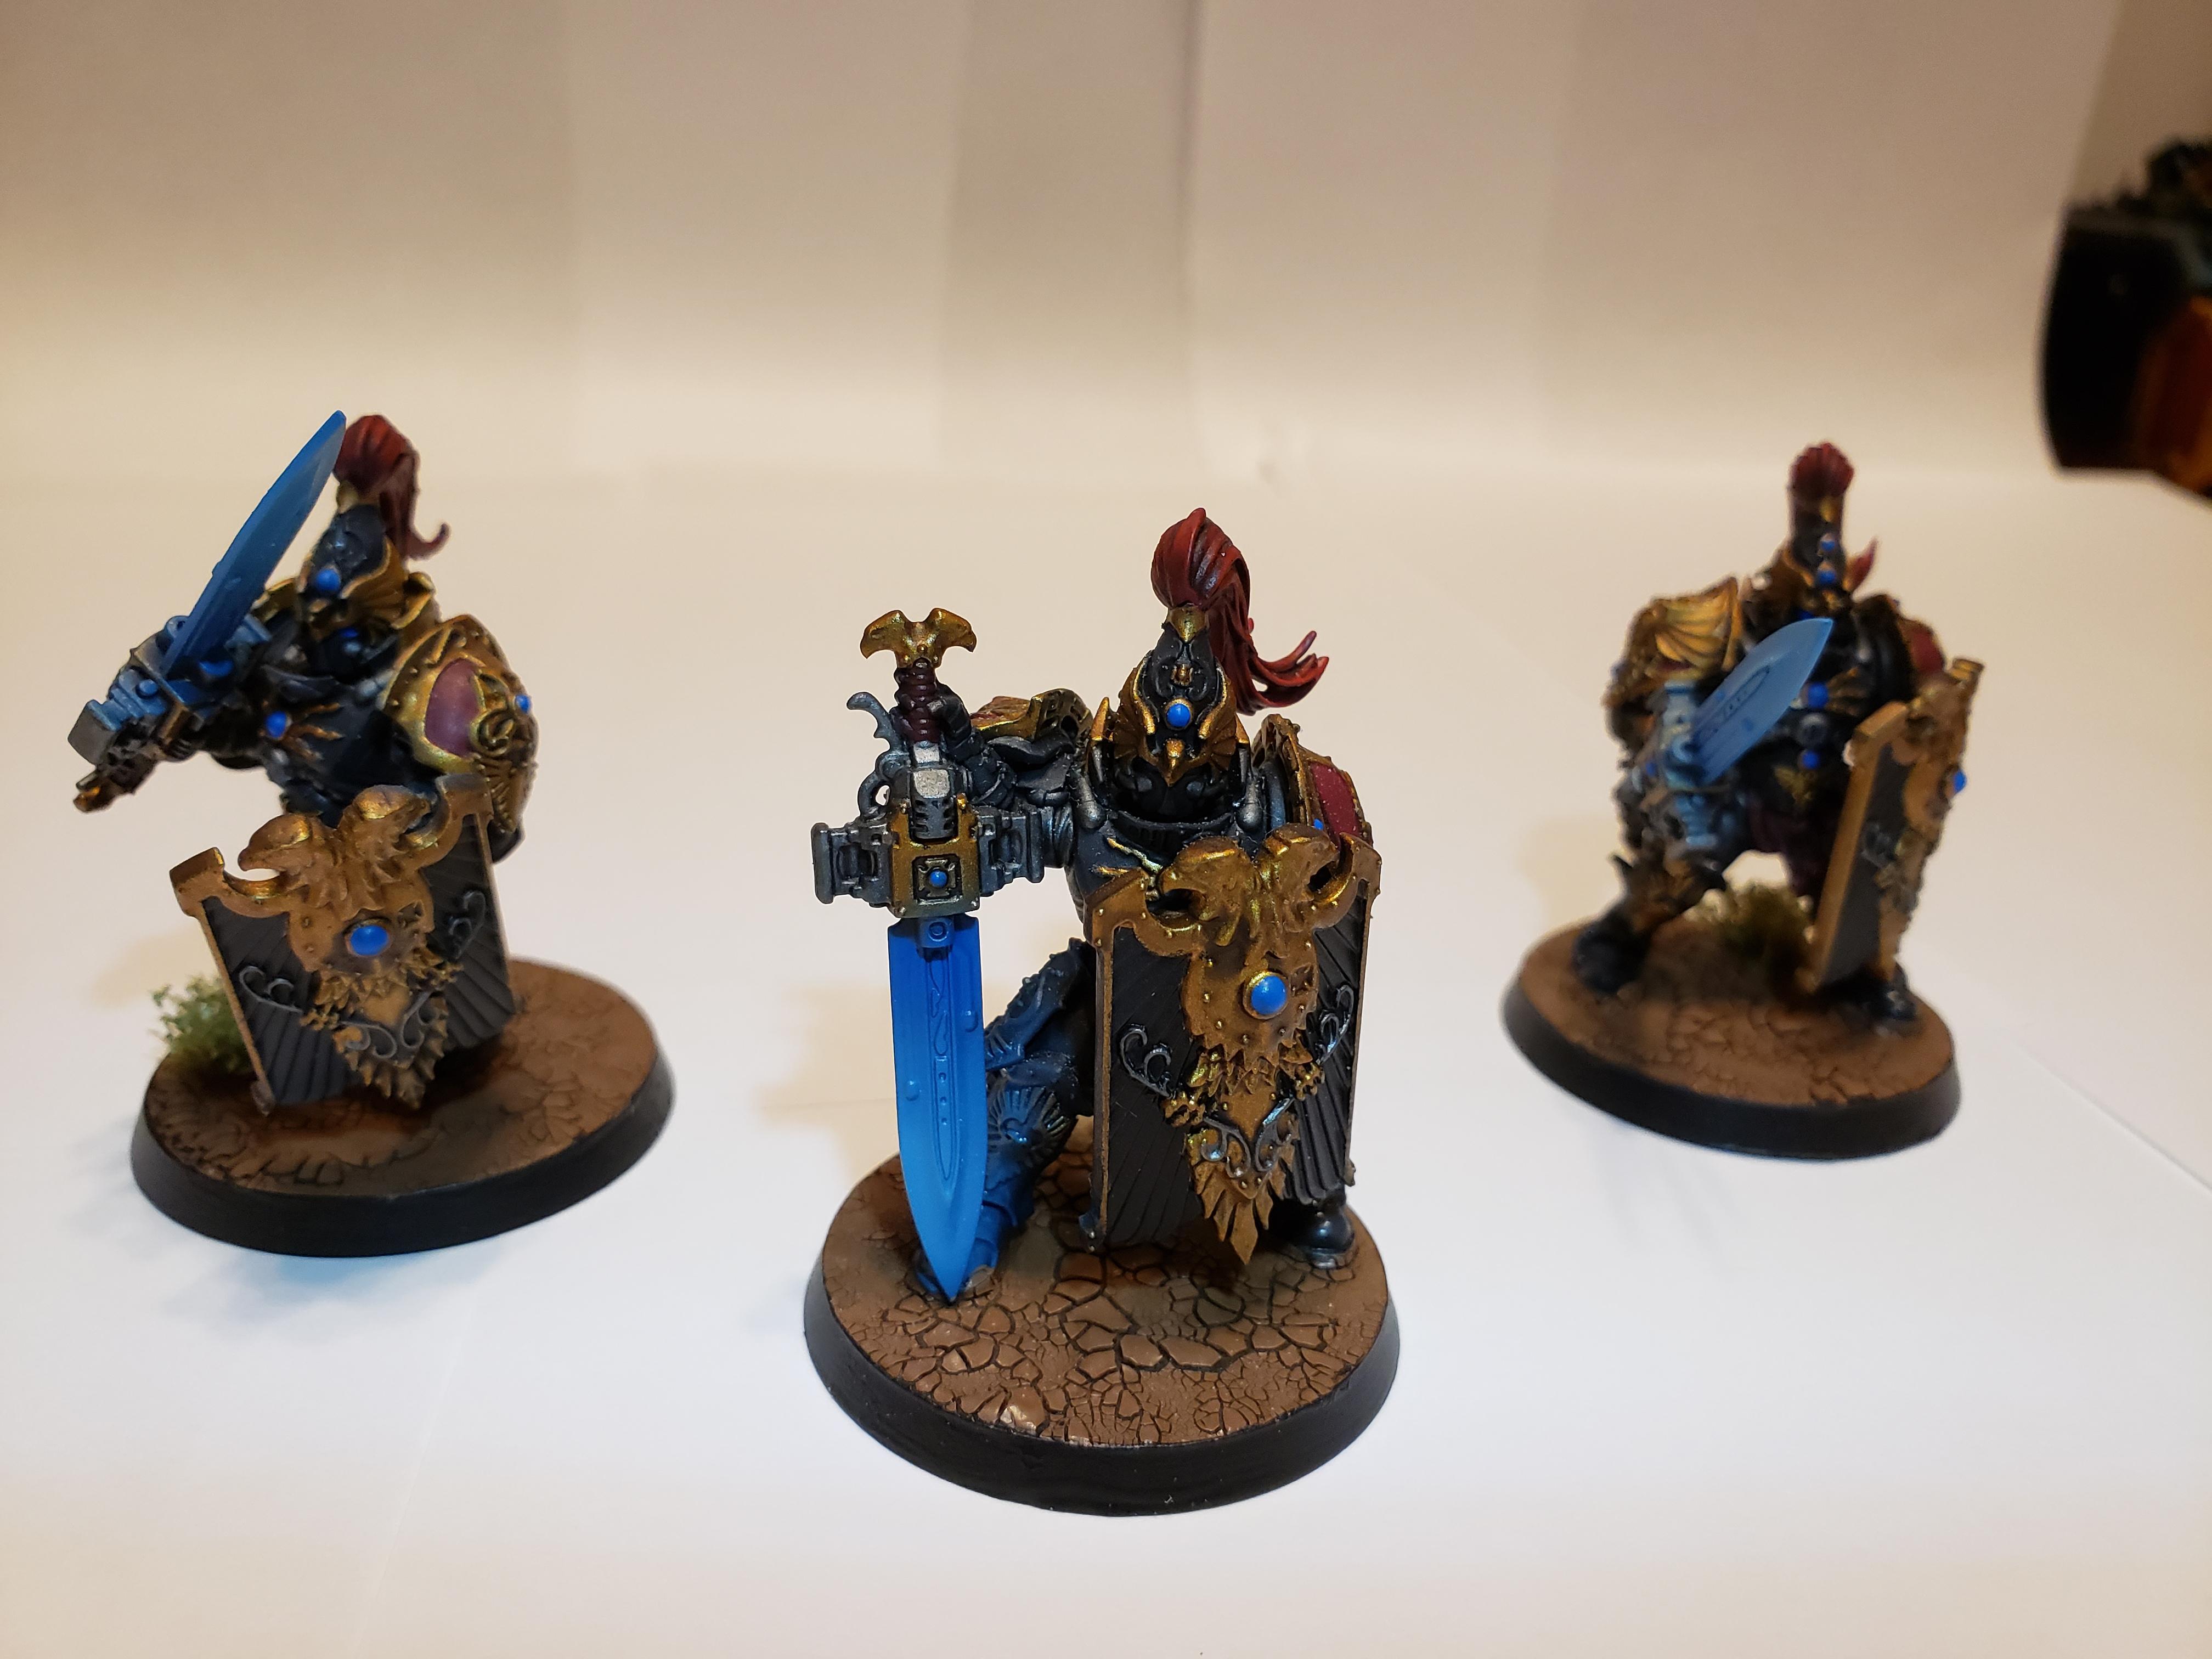 Adeptus Custodes, Custodian Guard, Sentinel Blade, Shadowkeepers, Storm Shield